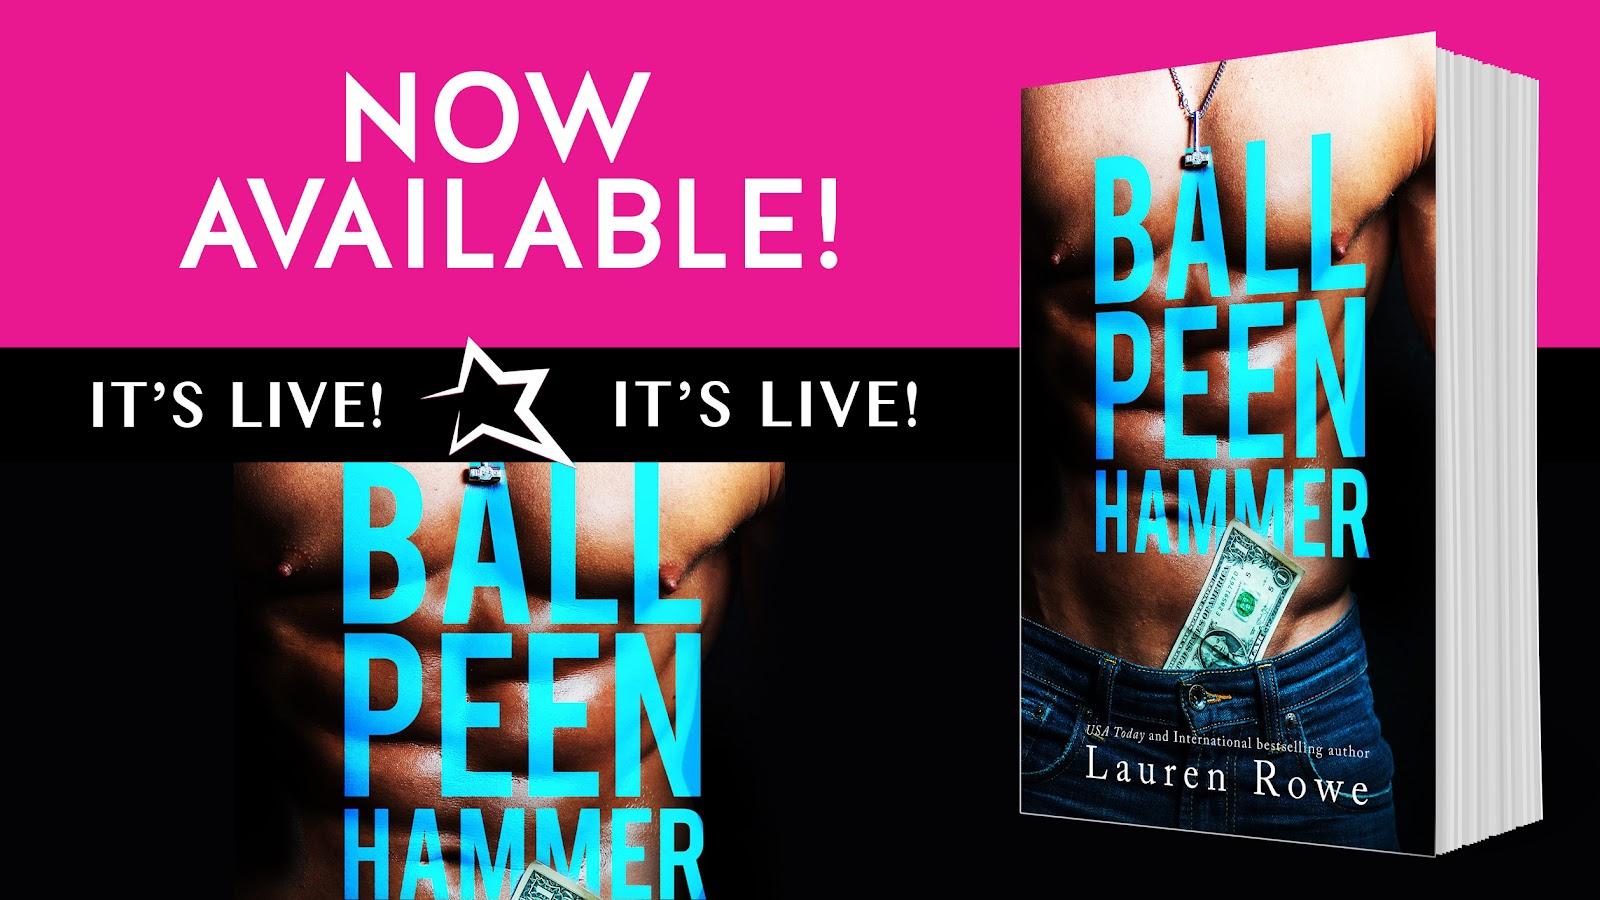 BALLPEEN_HAMMER_LIVE.jpg